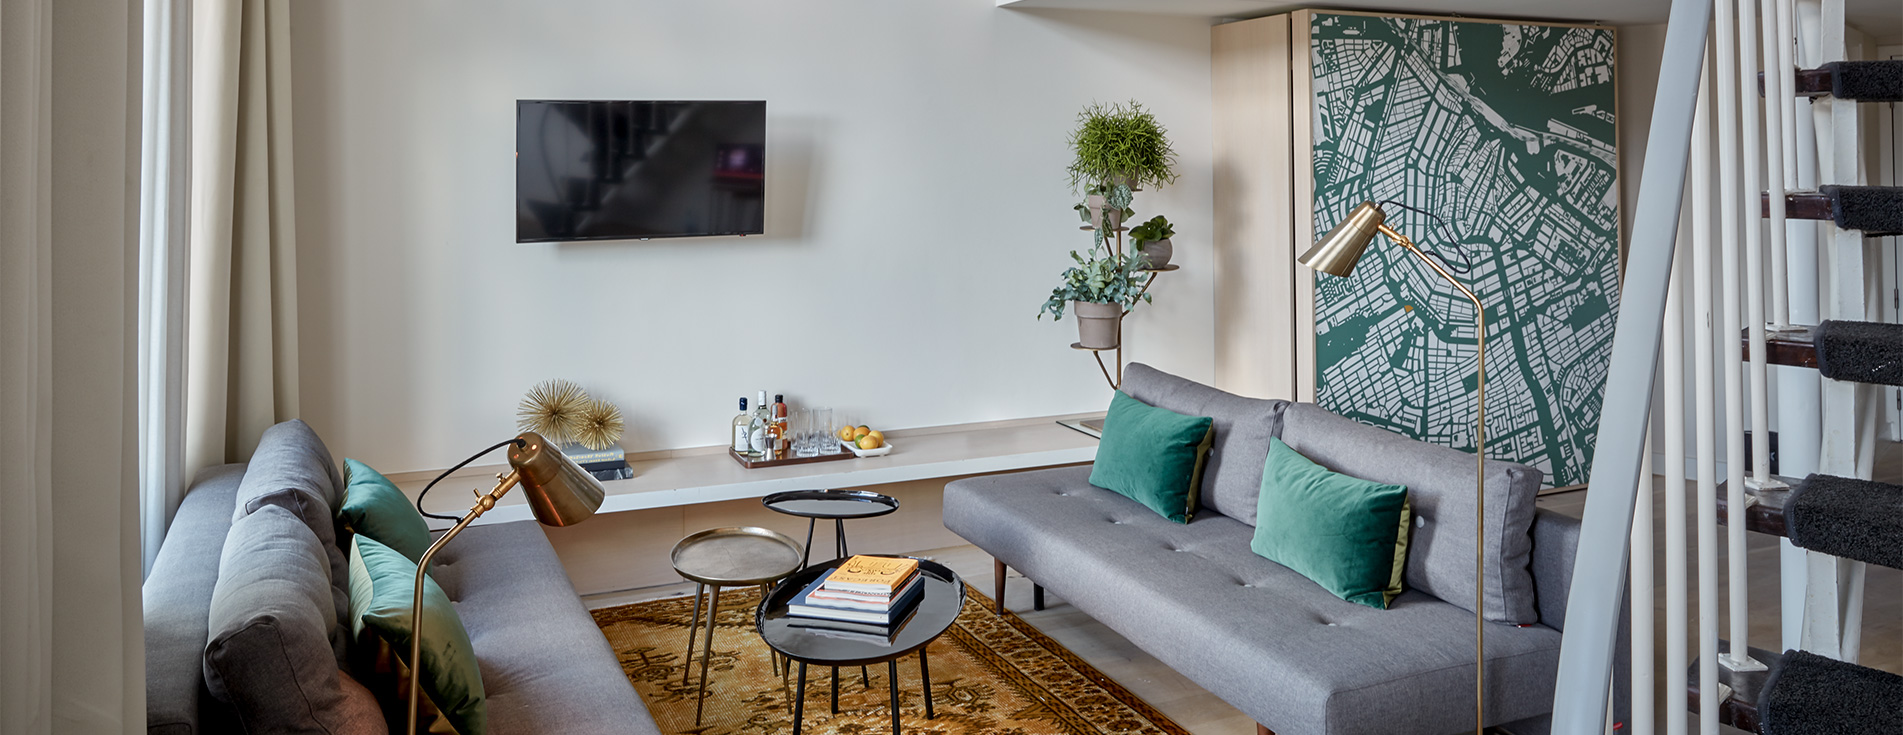 Park-Hotel-Amsterdam-Split-Level-Loft-Front-Page